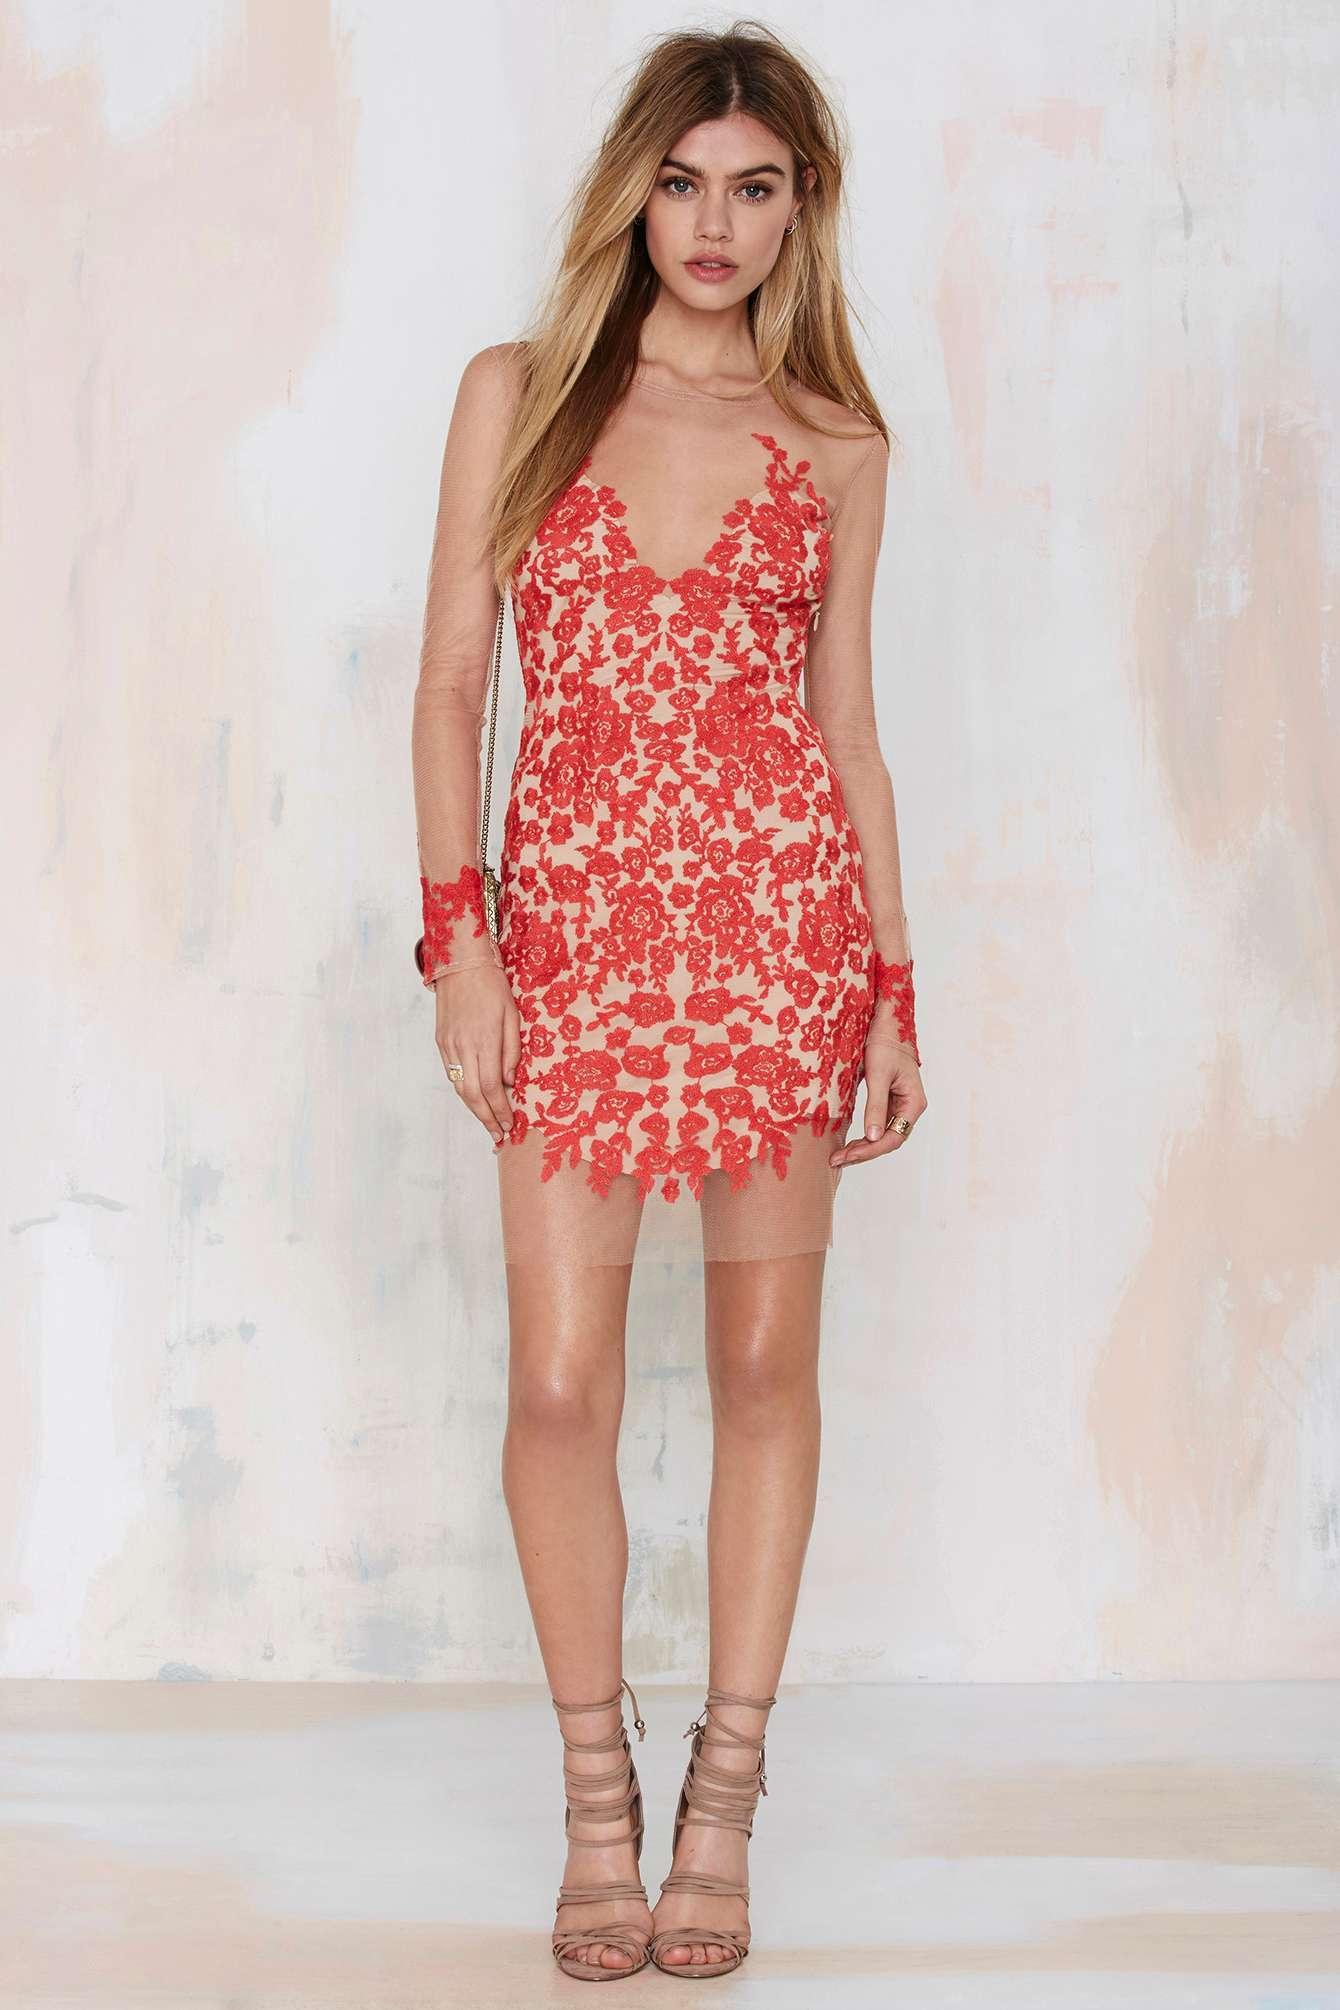 Luau maxi dress red